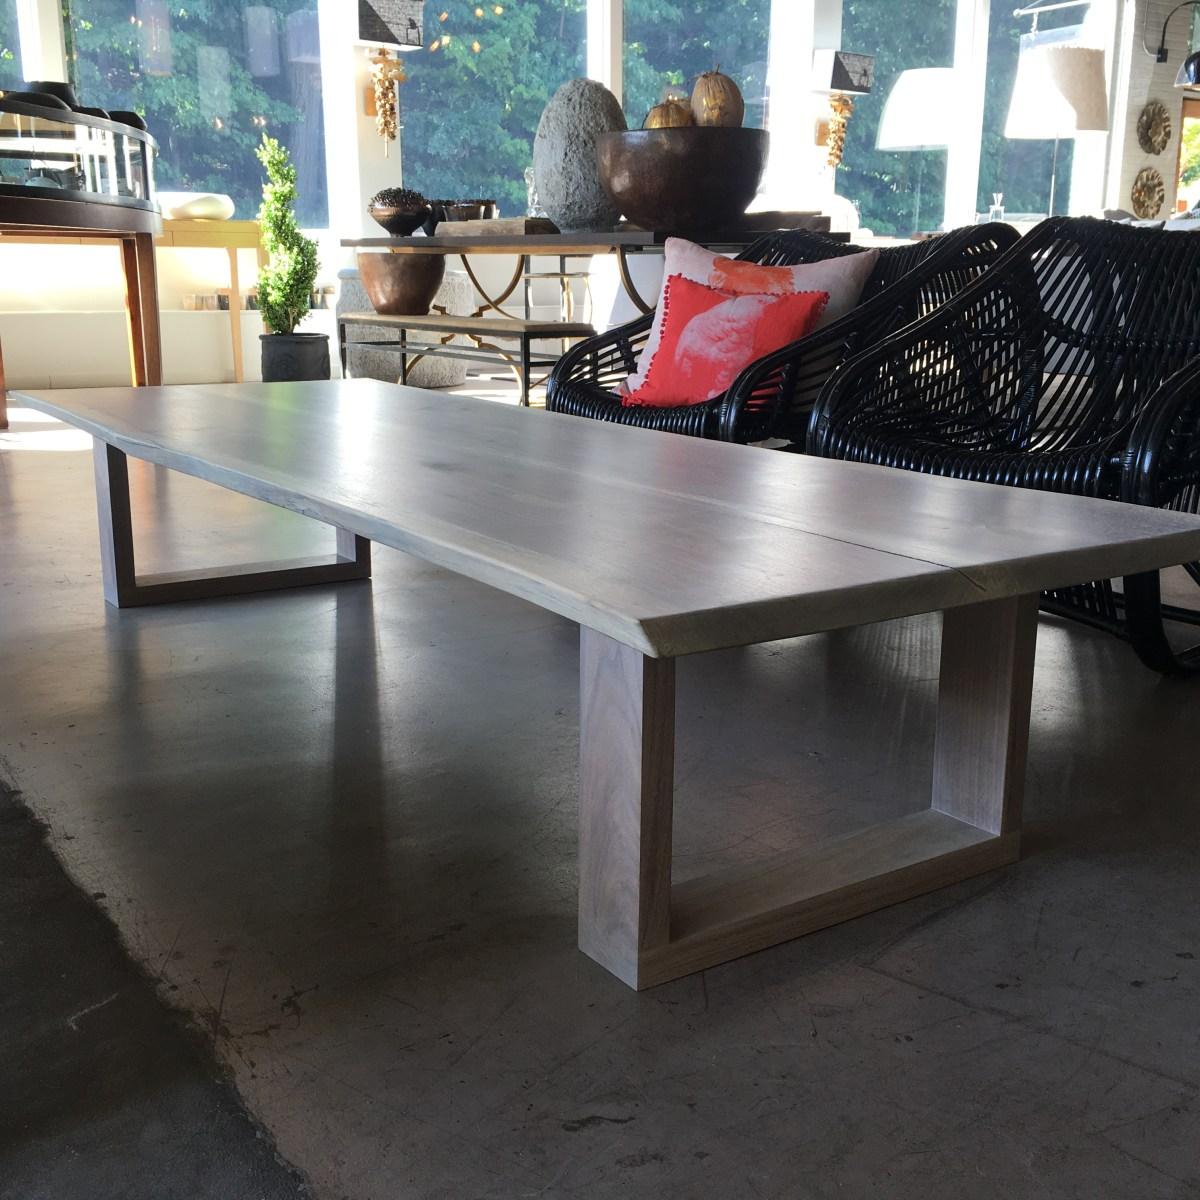 table-channel-black-walnut-mist-finish-1-artefacthome